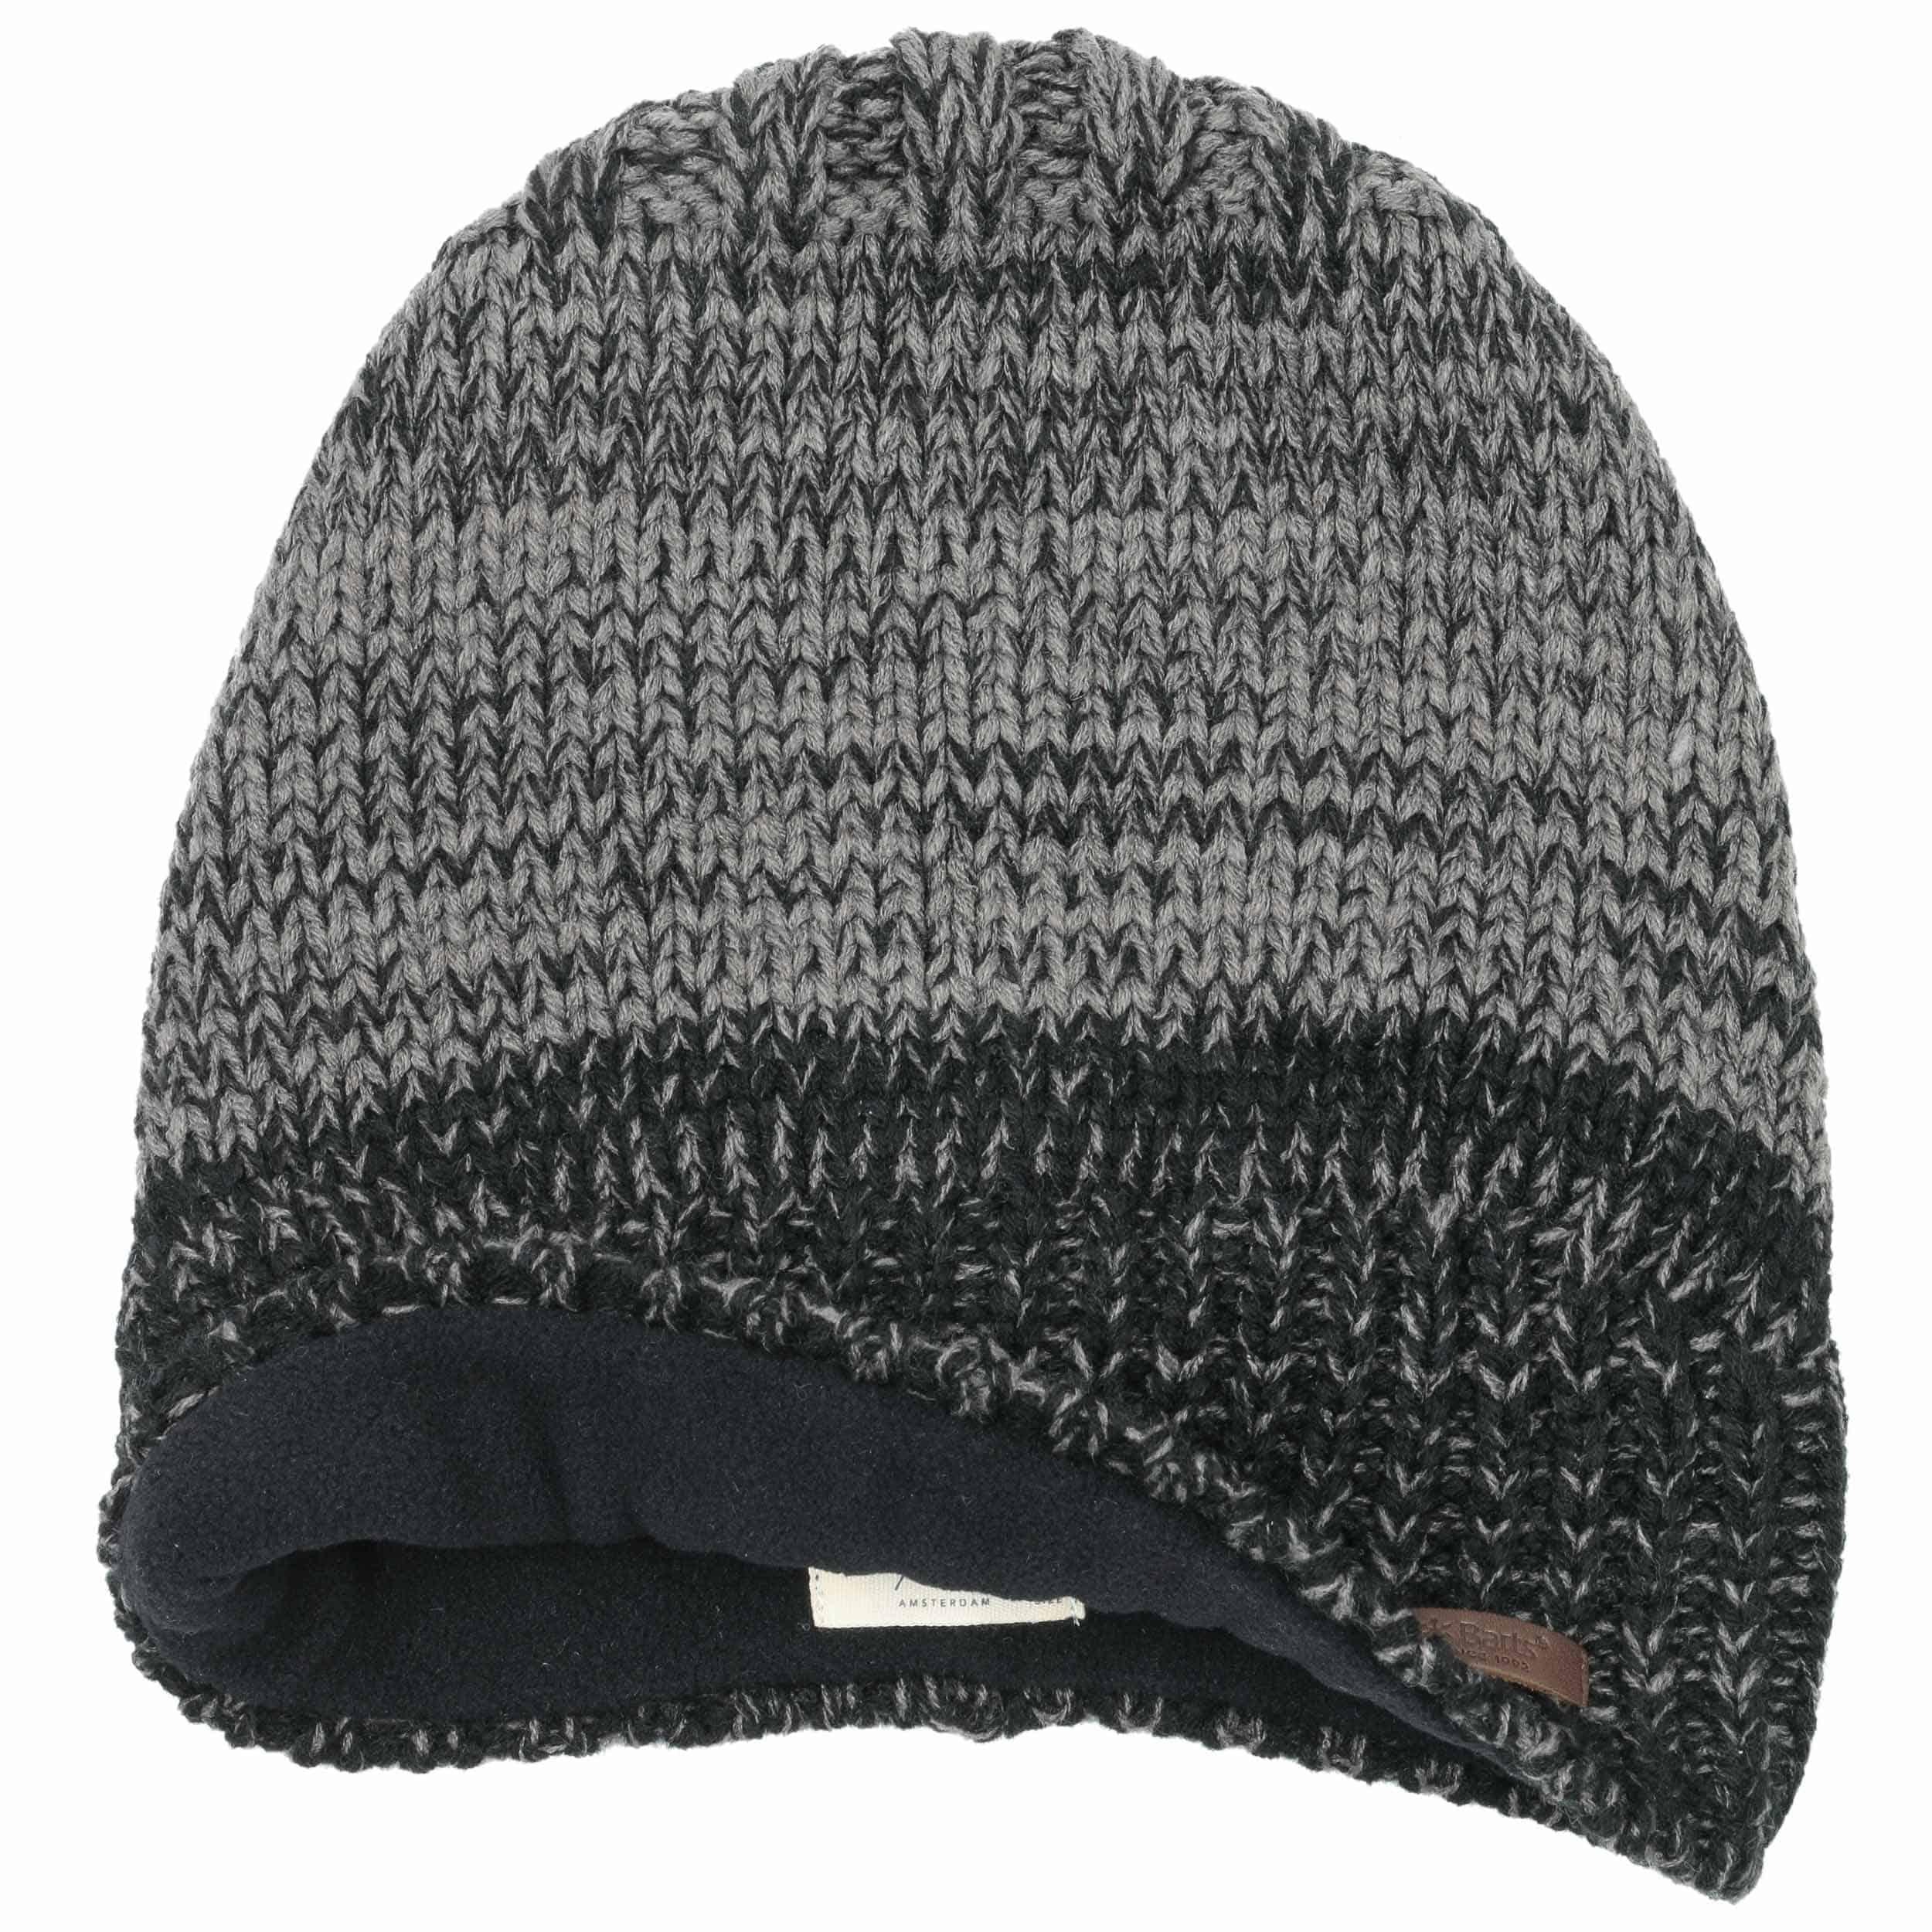 d55622e44ee ... Bonnet Beanie Brighton by Barts - noir-gris 1 ...